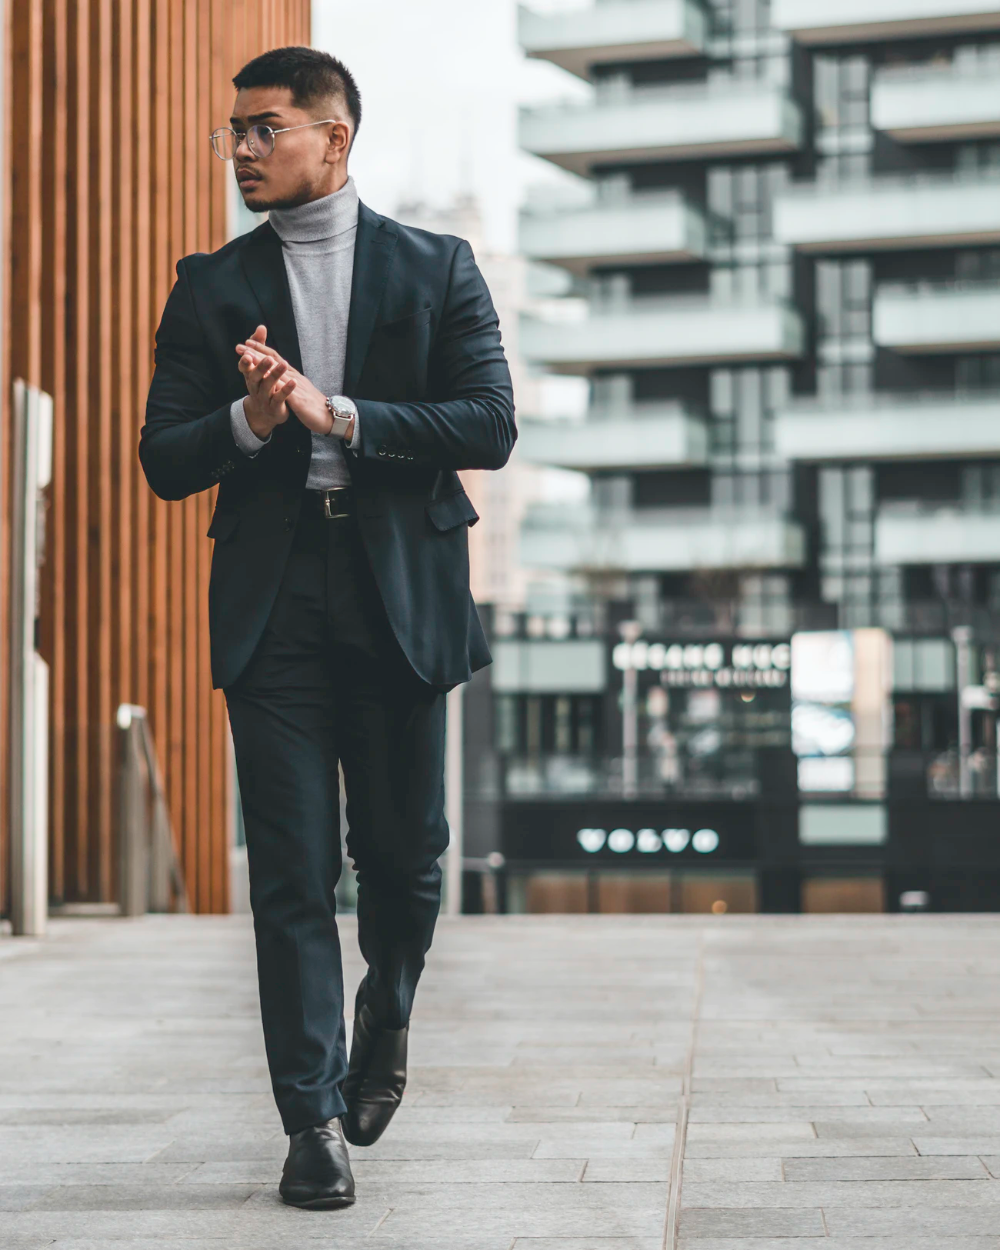 Man In Black Suit Standing On Sidewalk During Daytime Photo Free Suit Image On Unsplash Nice Dresses Turtle Neck Men Jacket Images